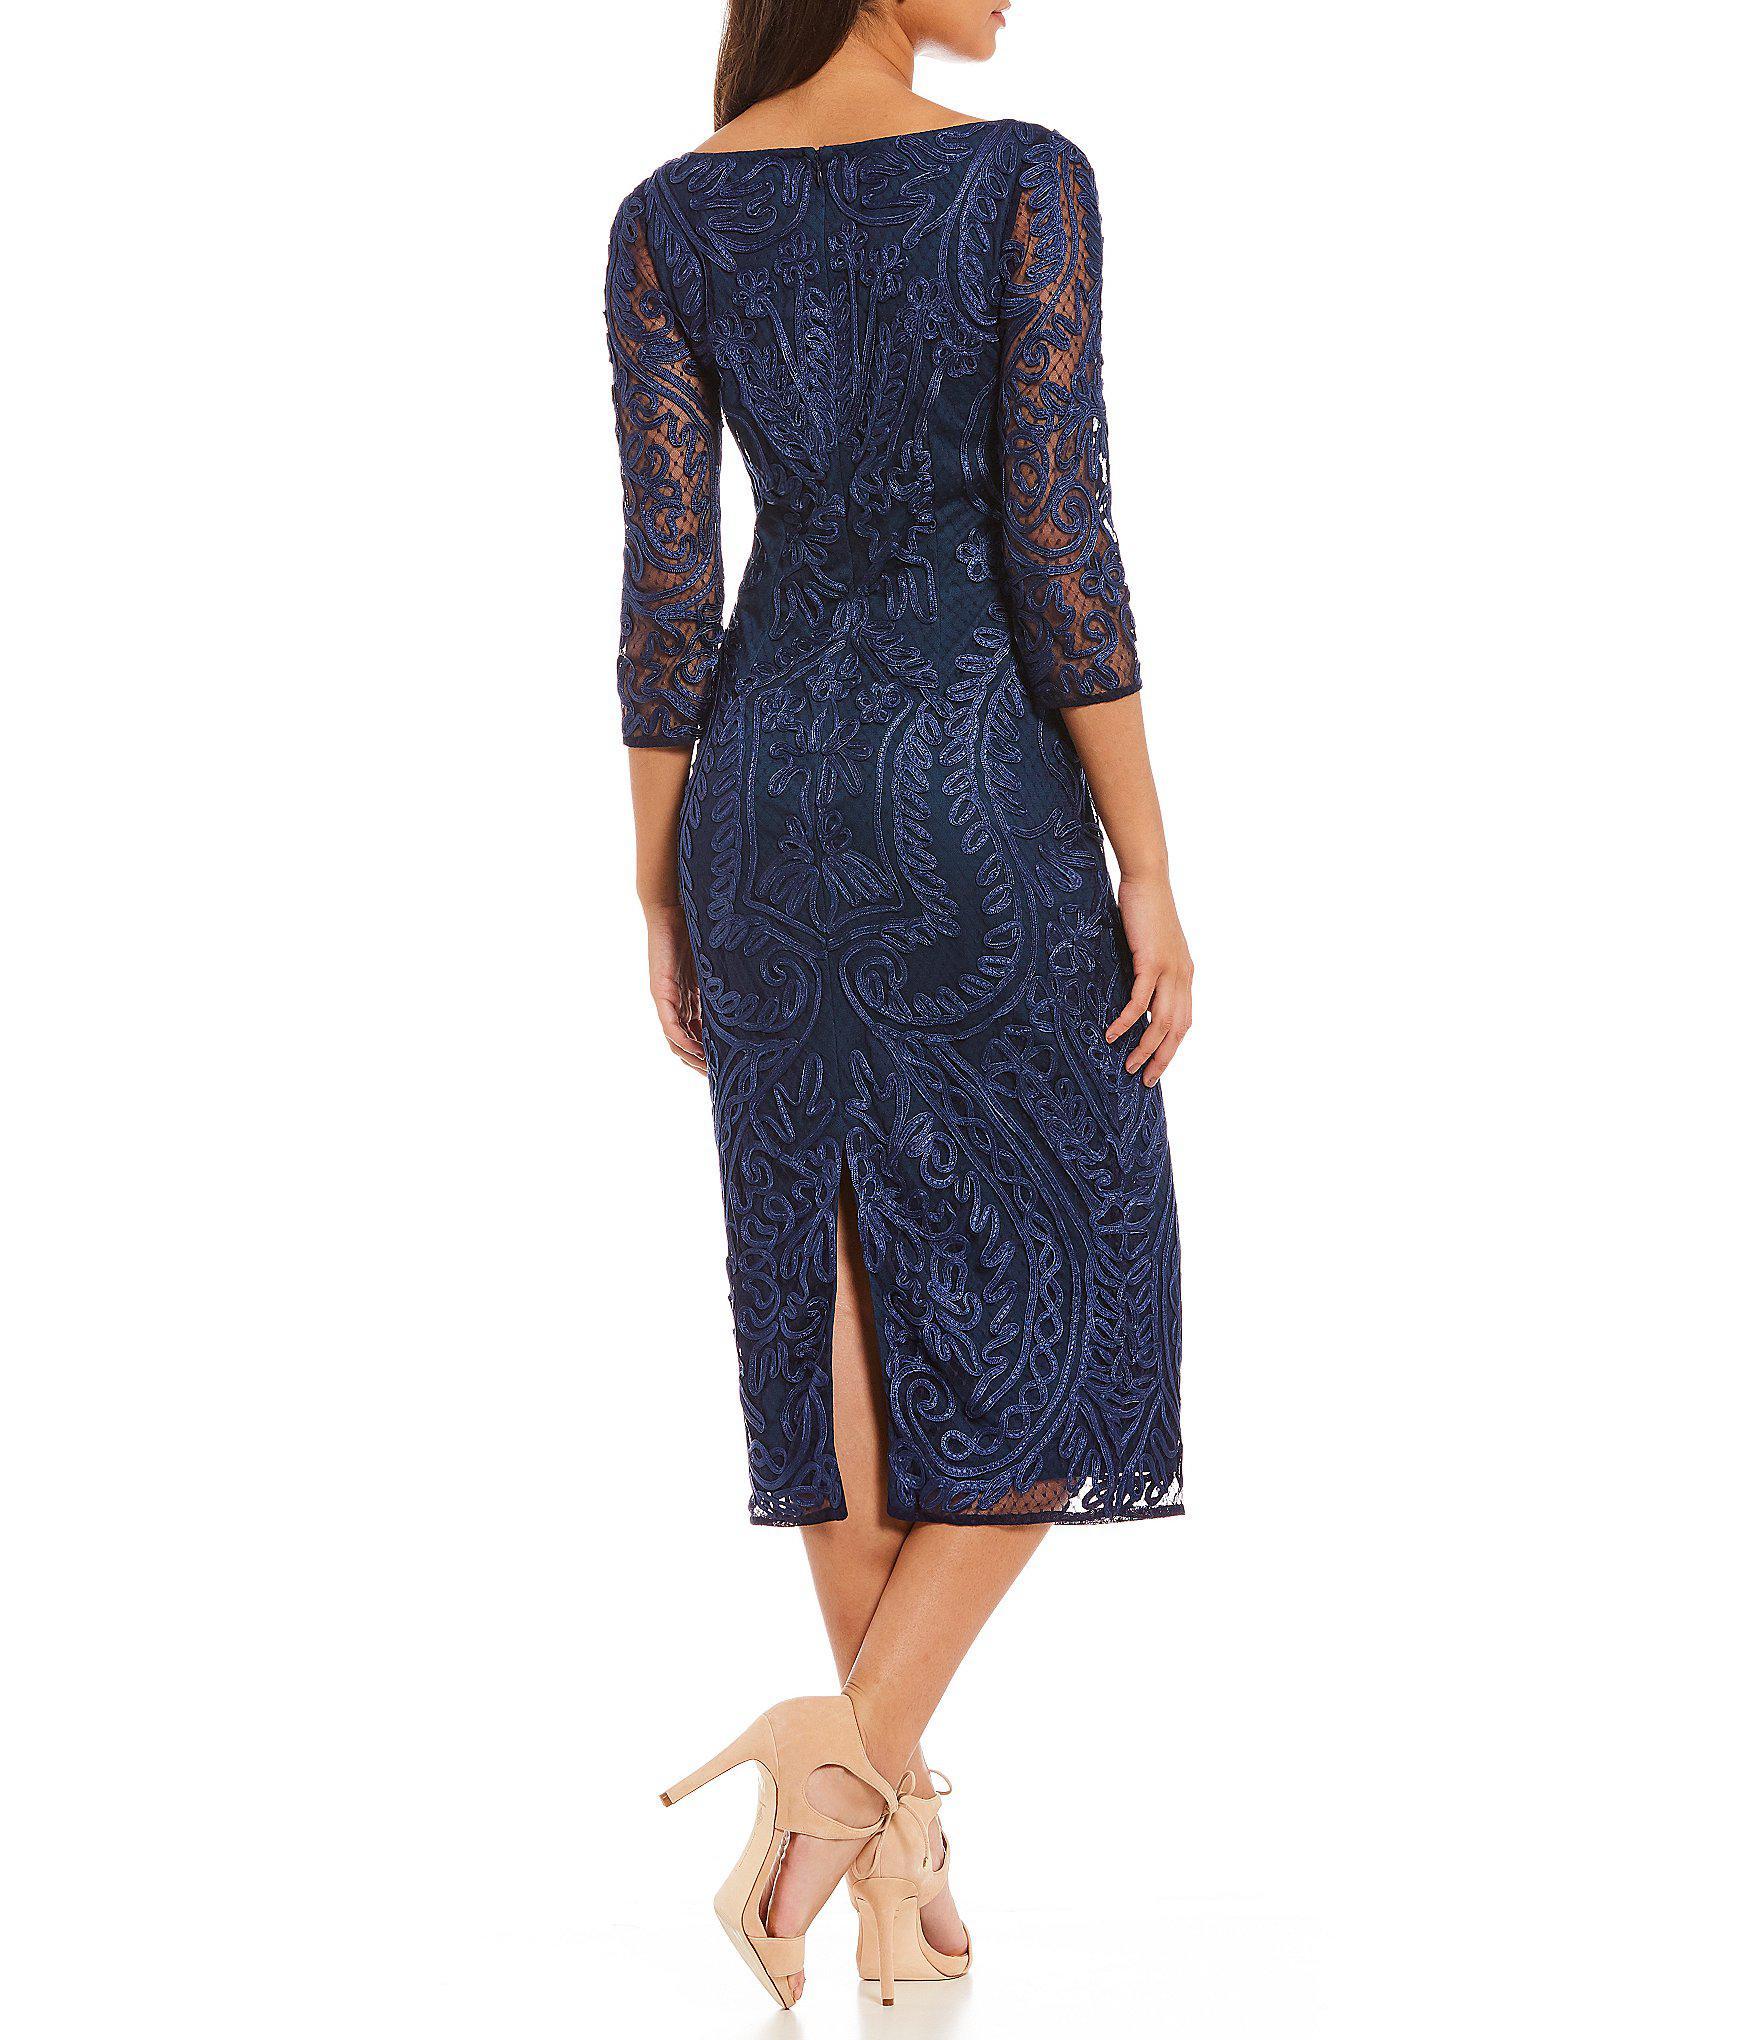 89e8fb09b2 JS Collections Scoop Neck Soutache Sheath Midi Dress in Blue - Lyst